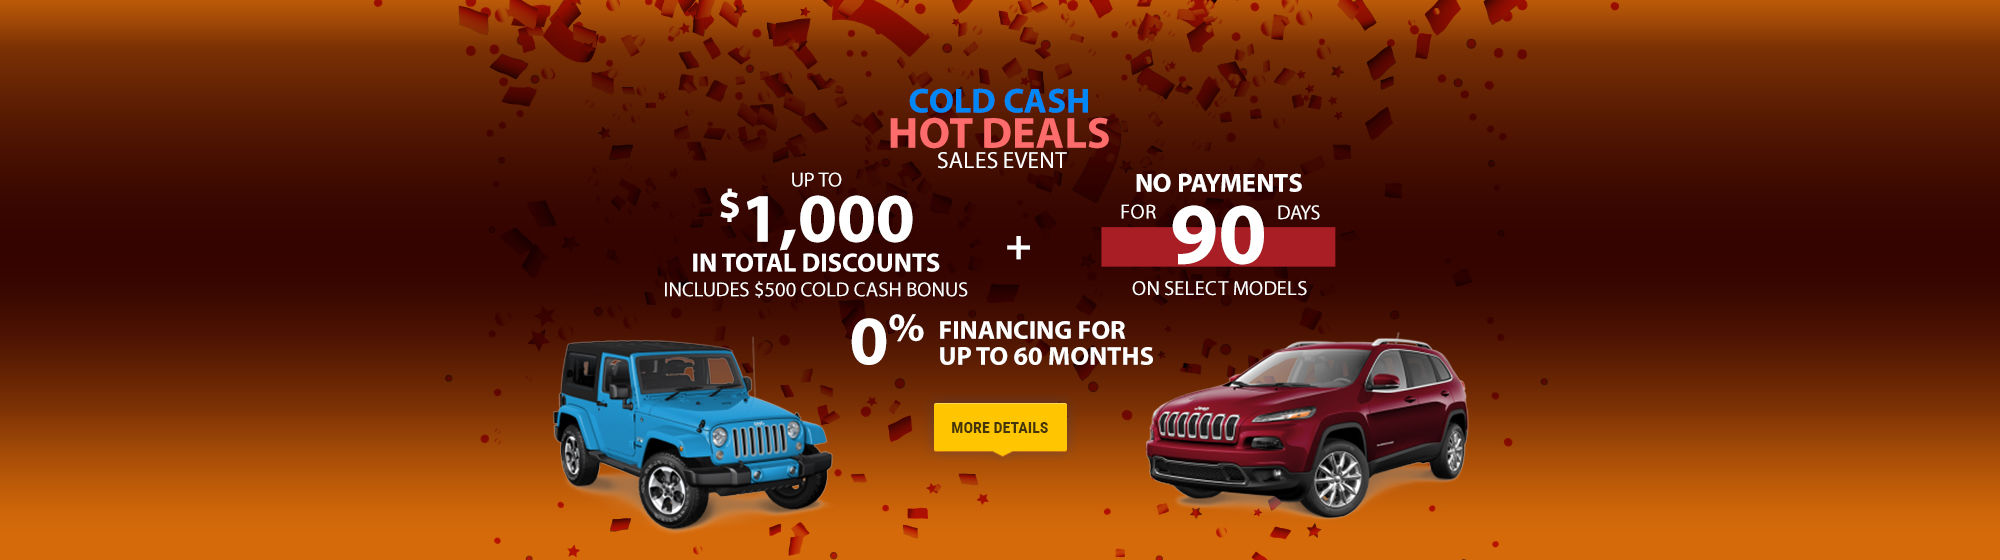 Cold Cash Hot Deals Sales Event - Jeep